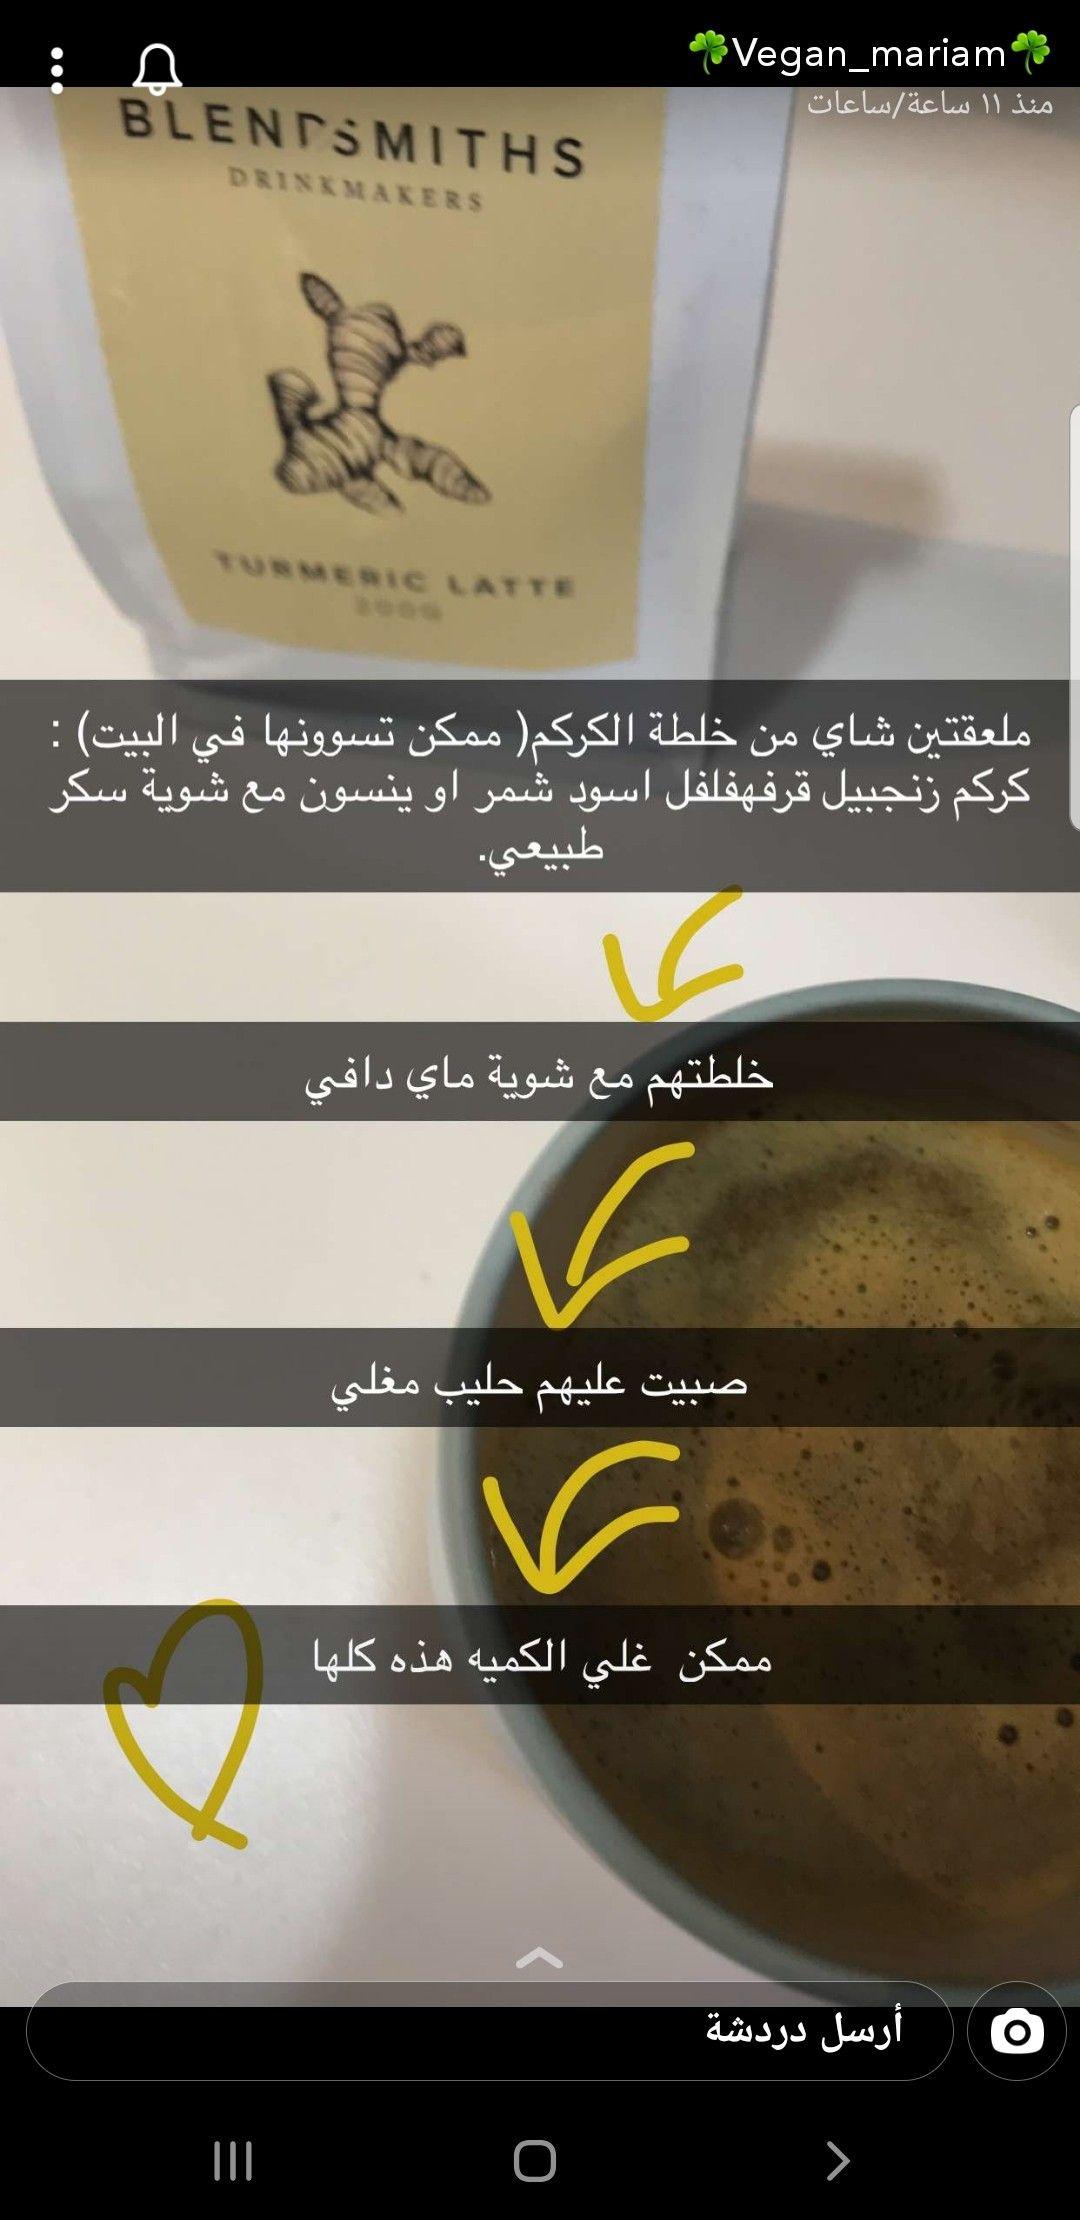 طريقه الايس كراميل ميكياتو Caramel Macchiato Ice Caramel Macchiato Coffee Drinks